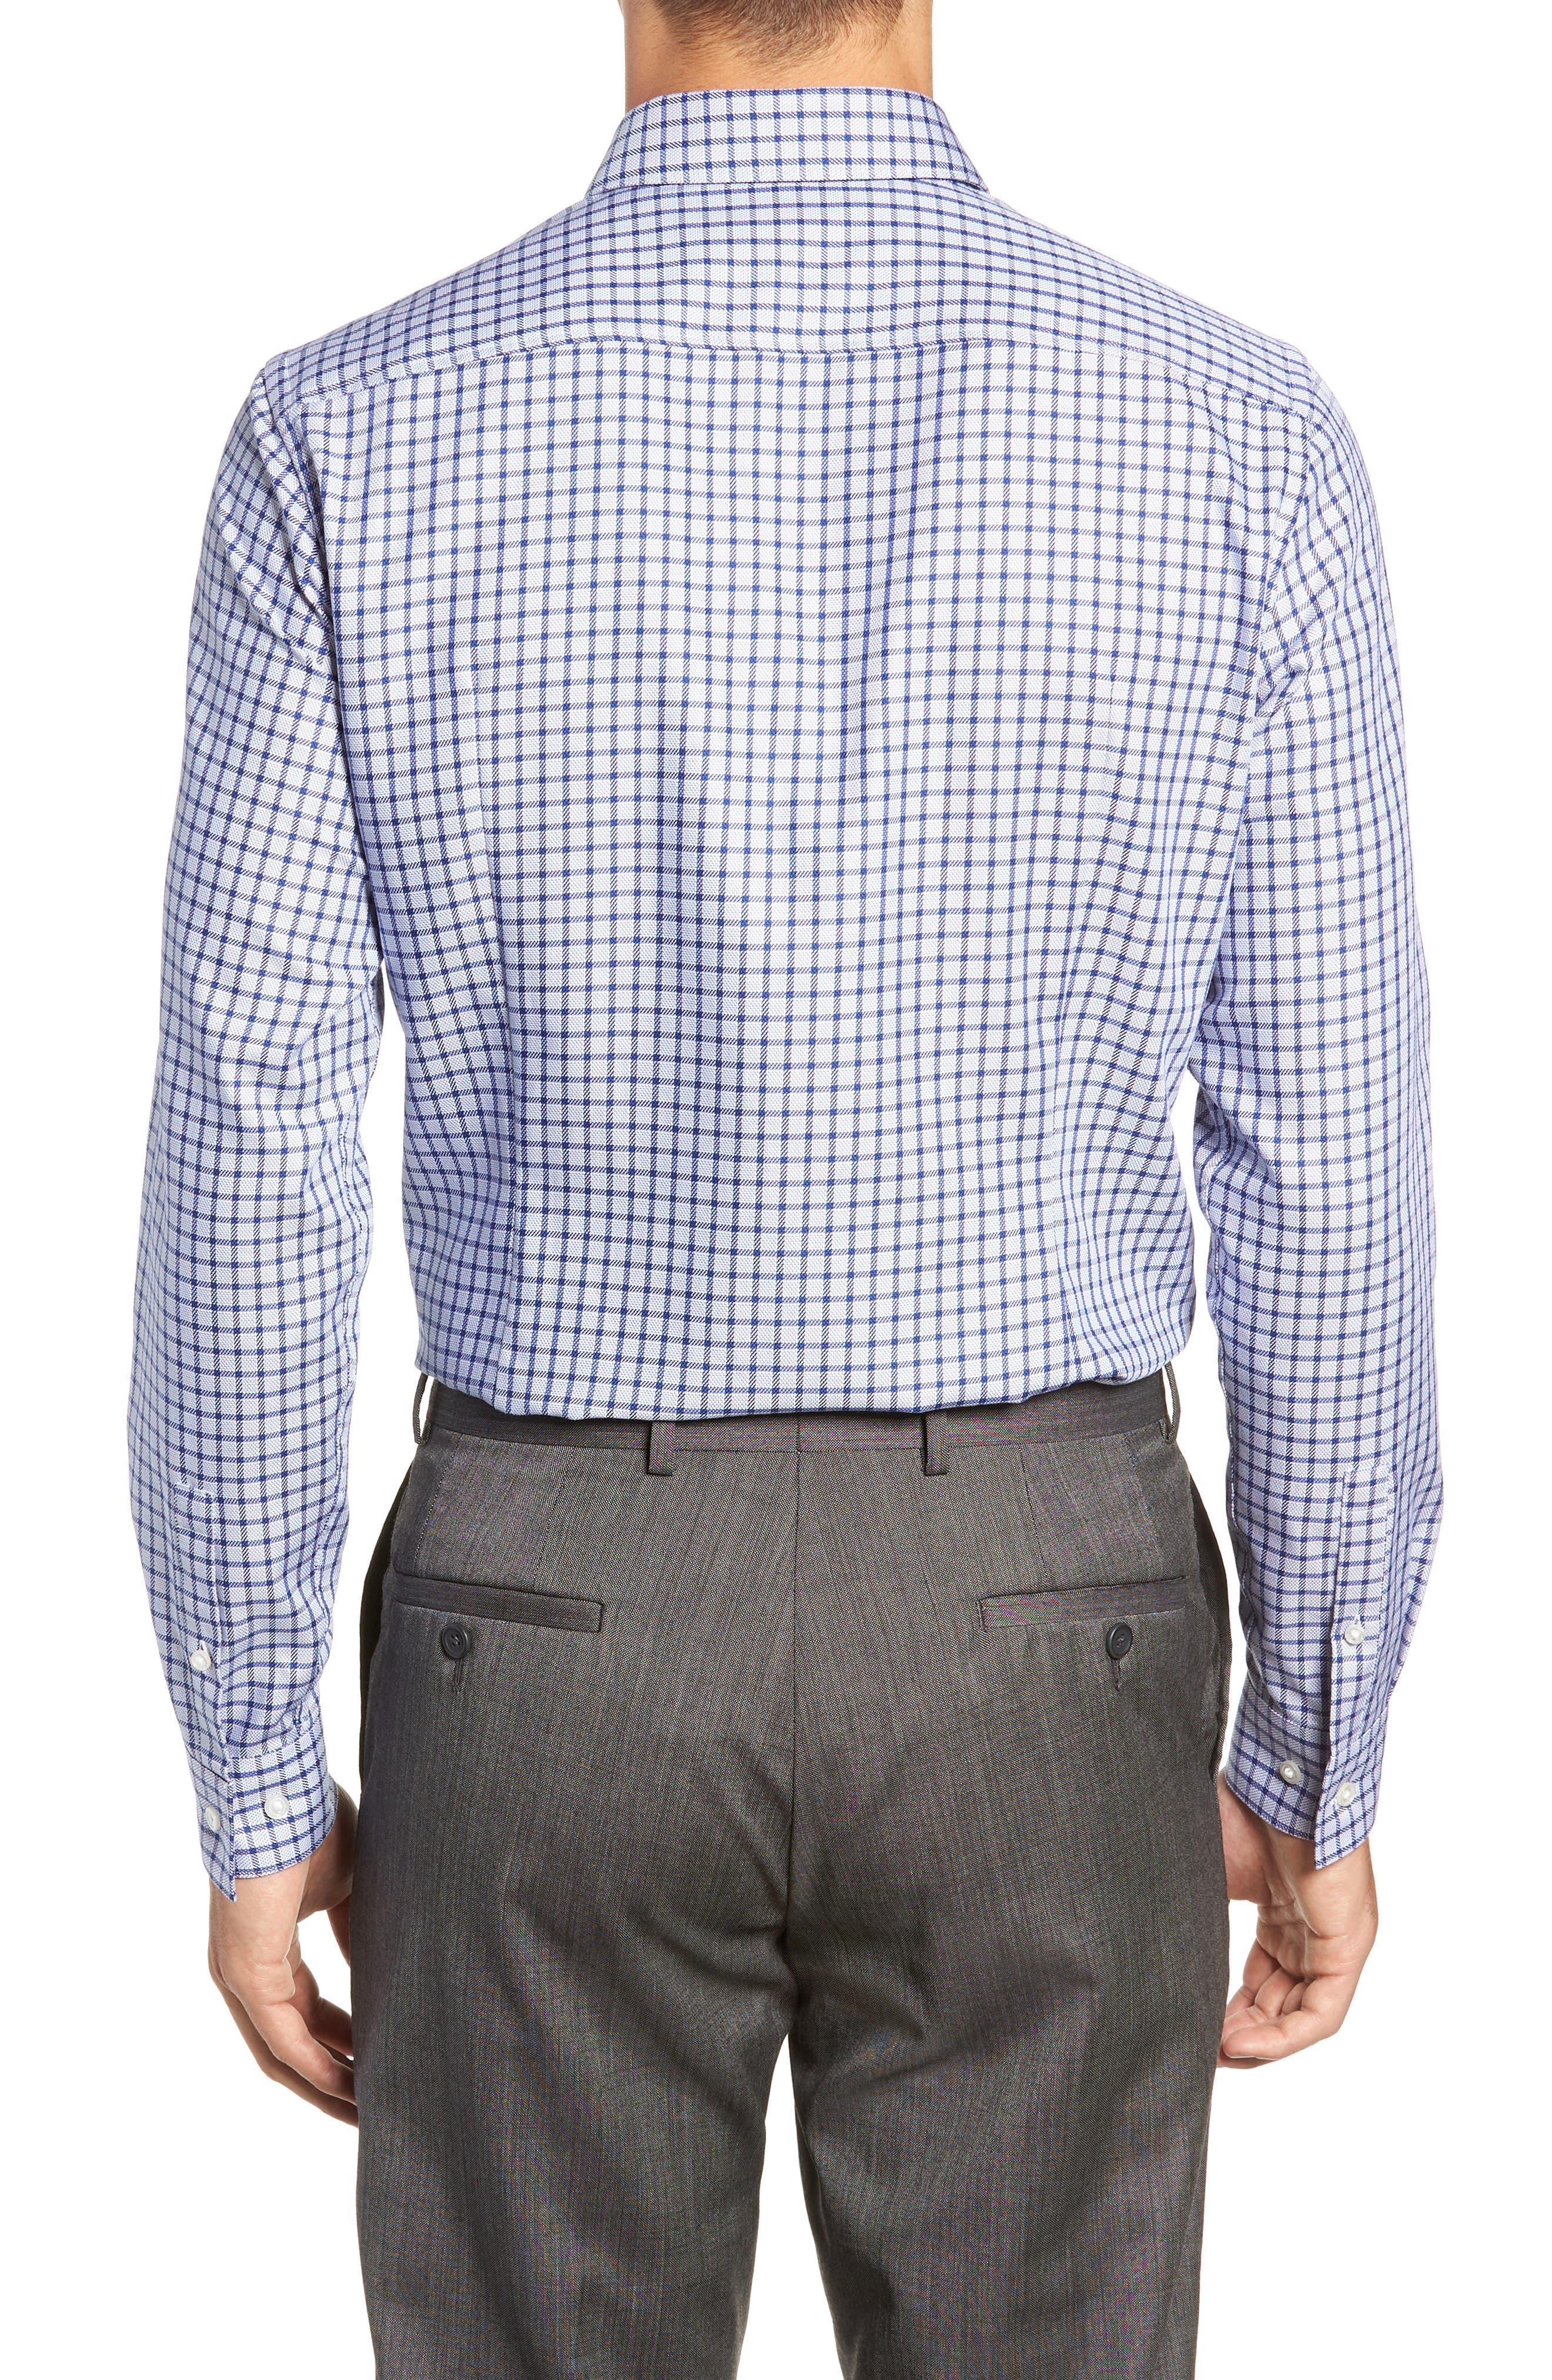 x Nordstrom Isaac Slim Fit Check Dress Shirt,                             Alternate thumbnail 3, color,                             BLUE